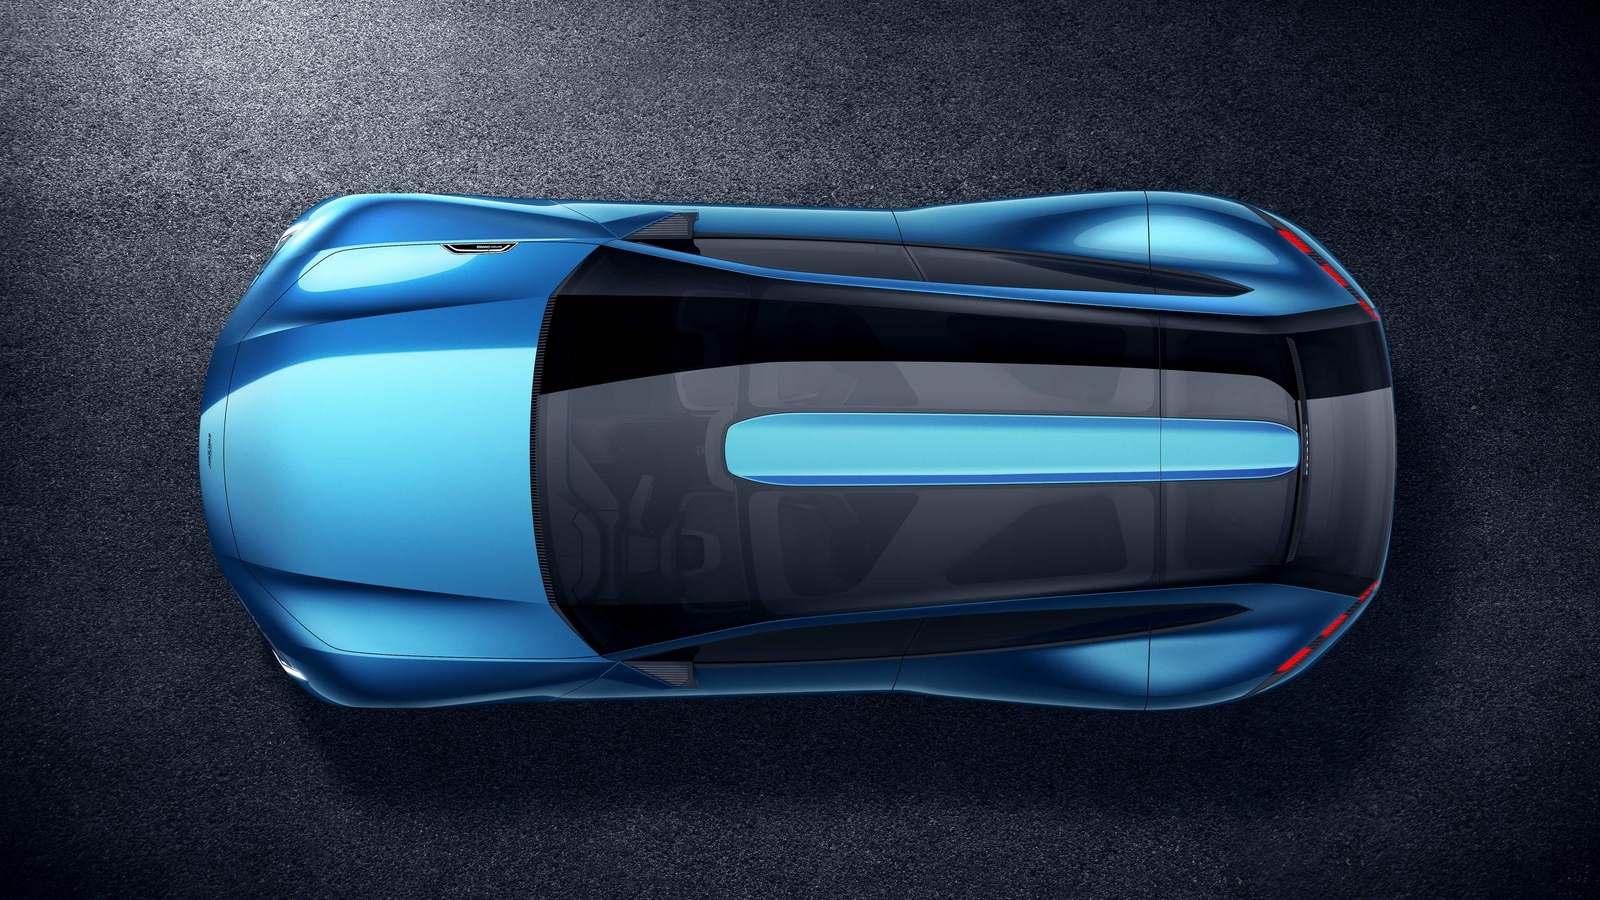 2017-Peugeot-Instinct-Concept-09